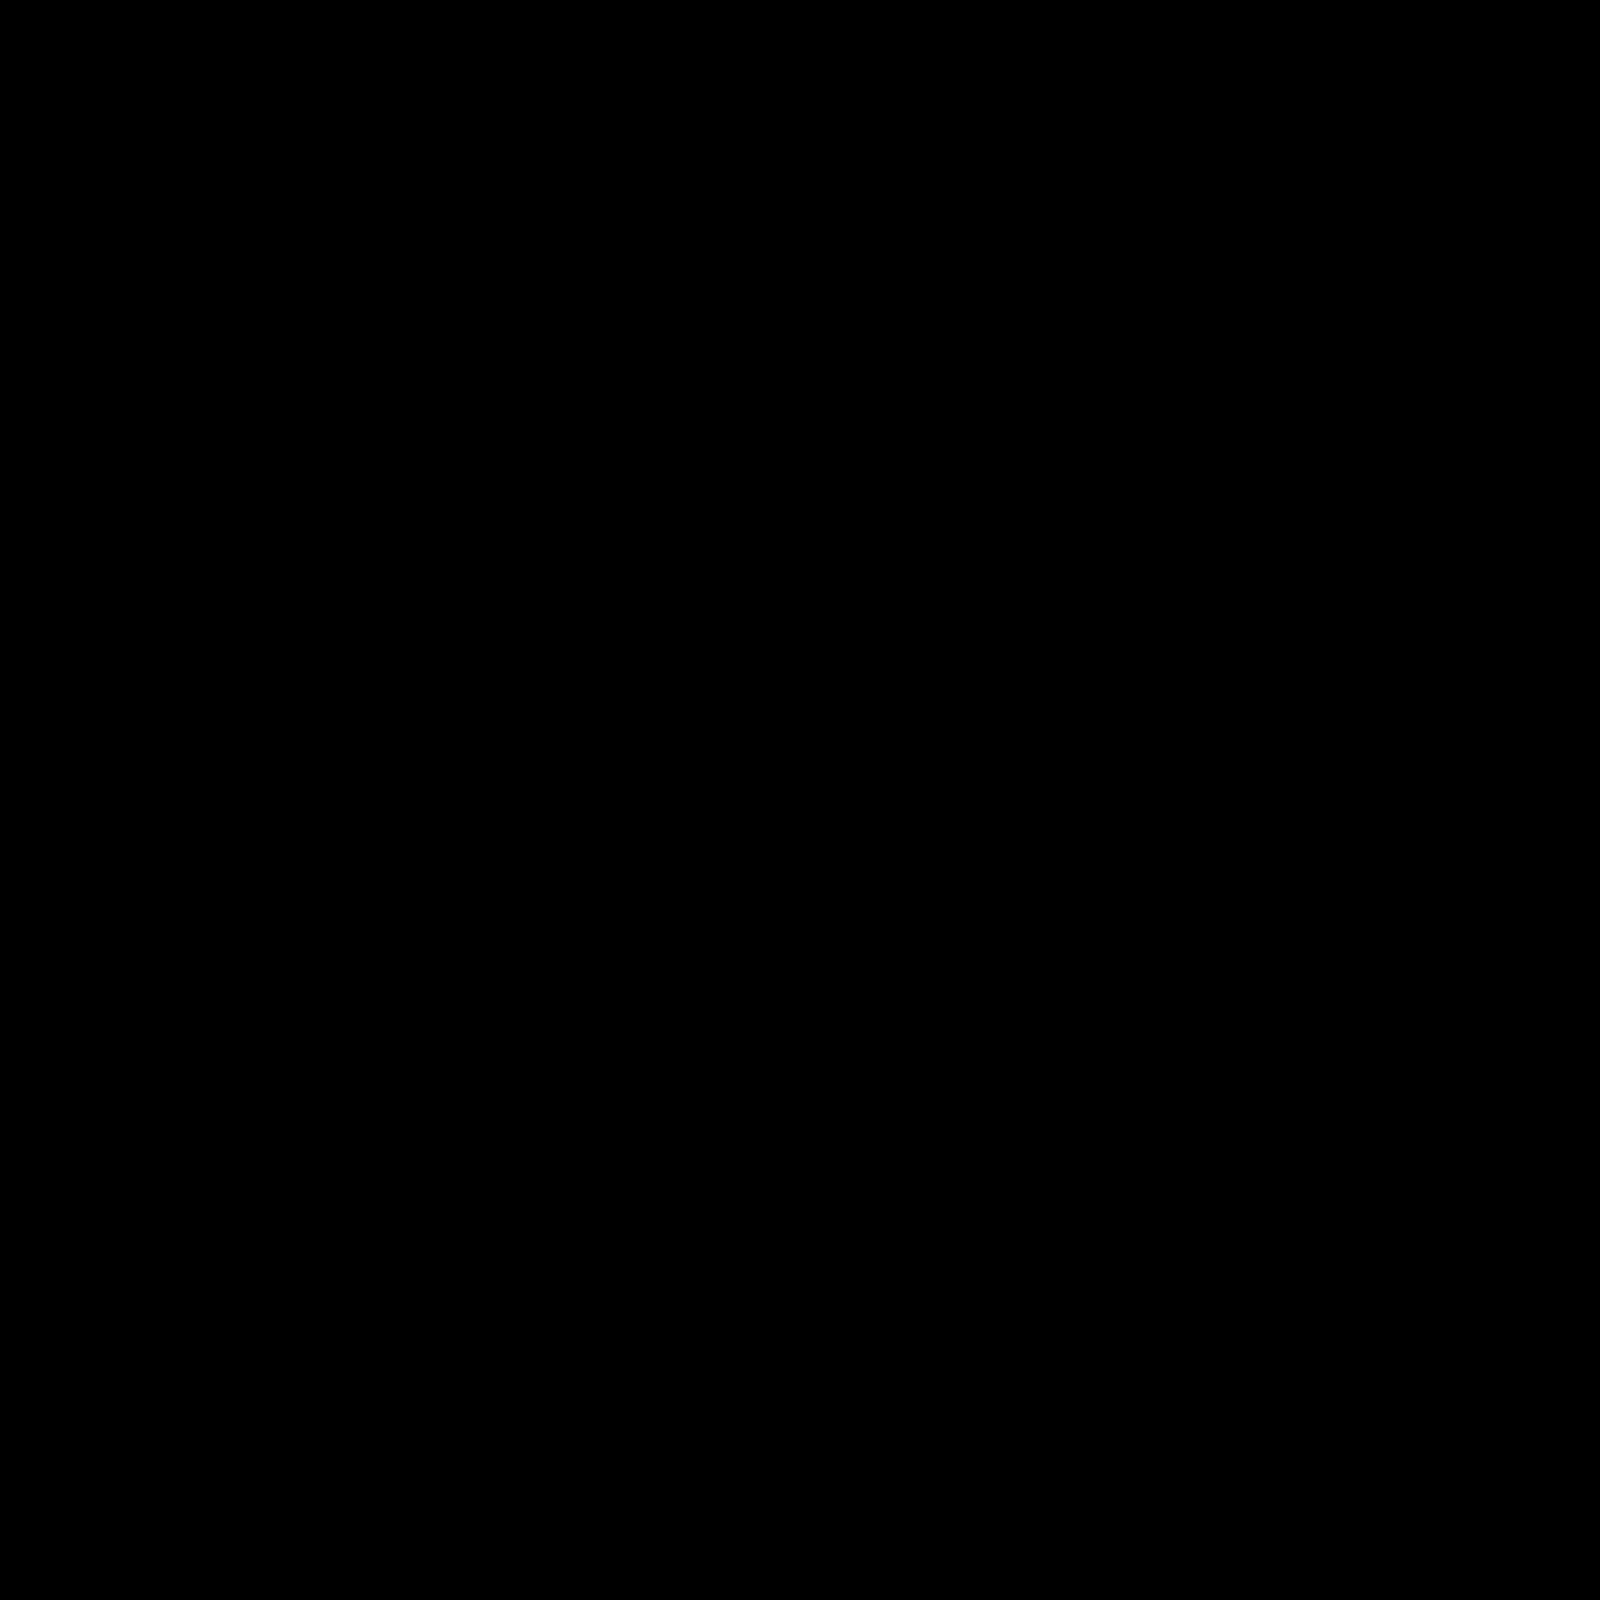 amazon-logo - FBTB